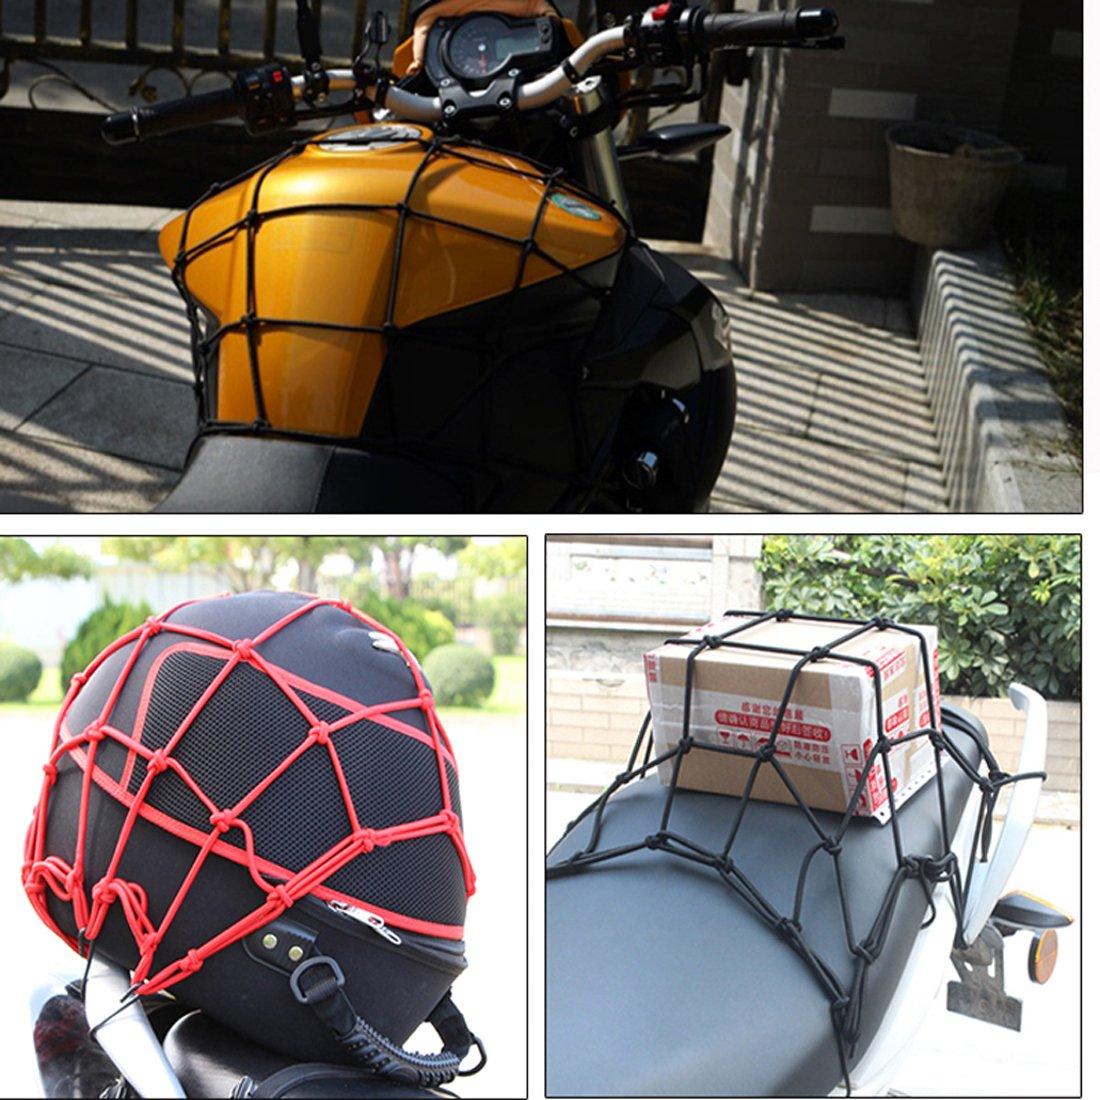 Andux Zone Motorrad Gep/äcknetz Transportnetz Netz f/ür Fahrrad Gep/äcknetz f/ür Fahrradkorb Gep/äcknetz WD-01